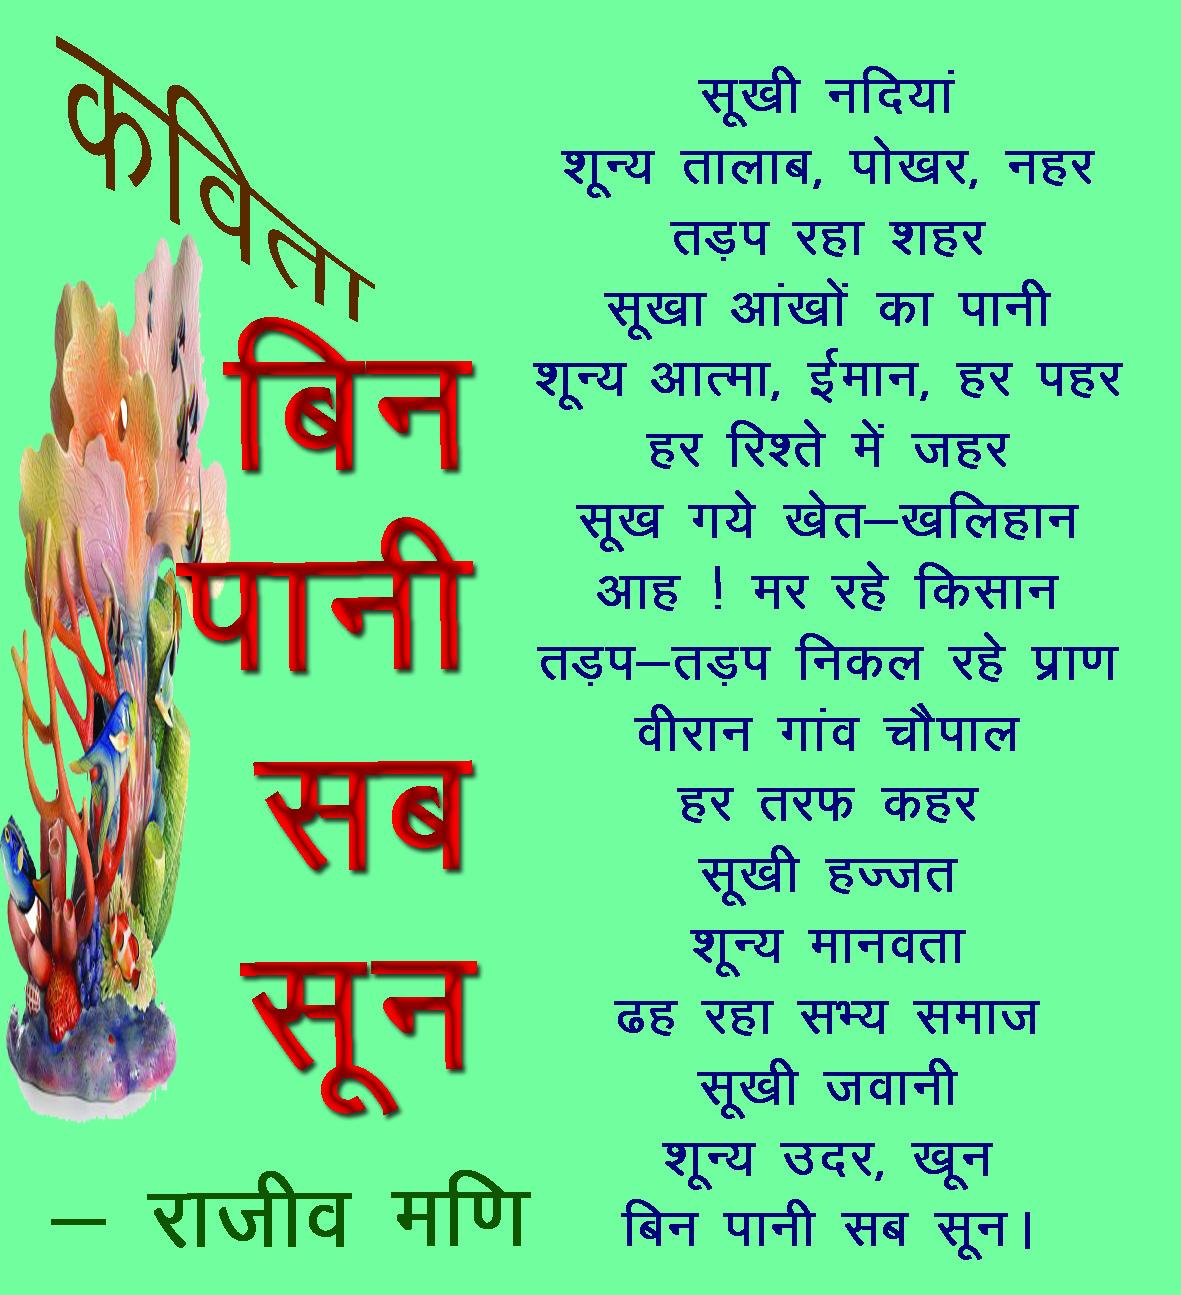 paryavaran slogan Posts about paryavaran written by rajni vijay singla.